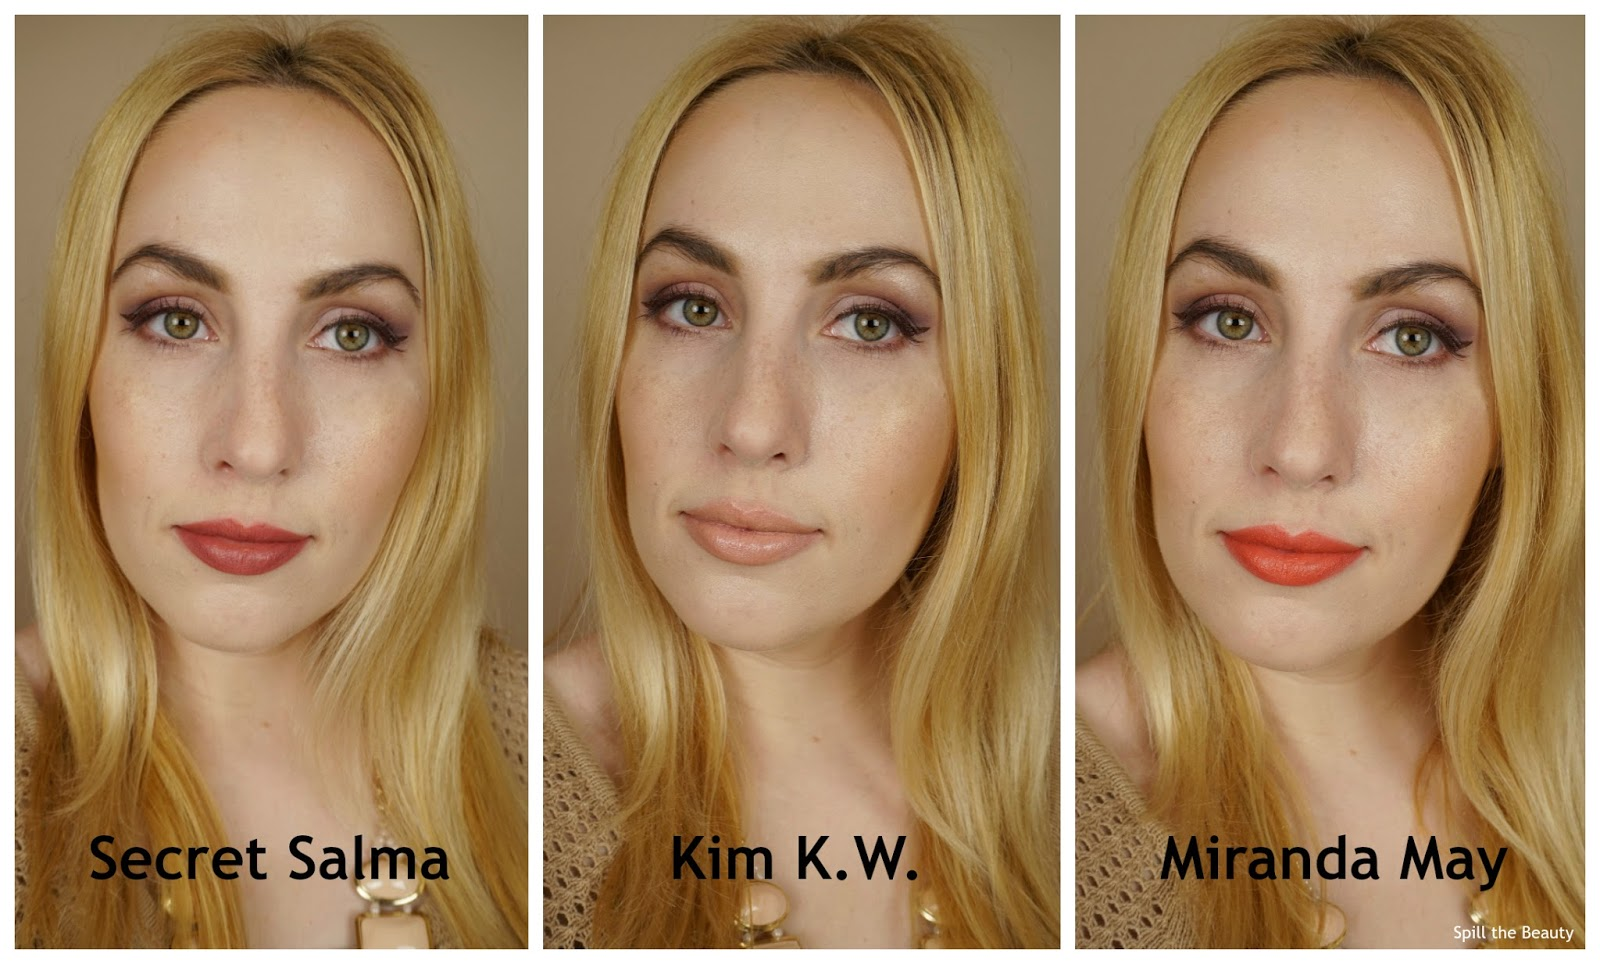 charlotte tilbury hot lips lipstick secret salma kim k.w. miranda may review swatches look arm swatches